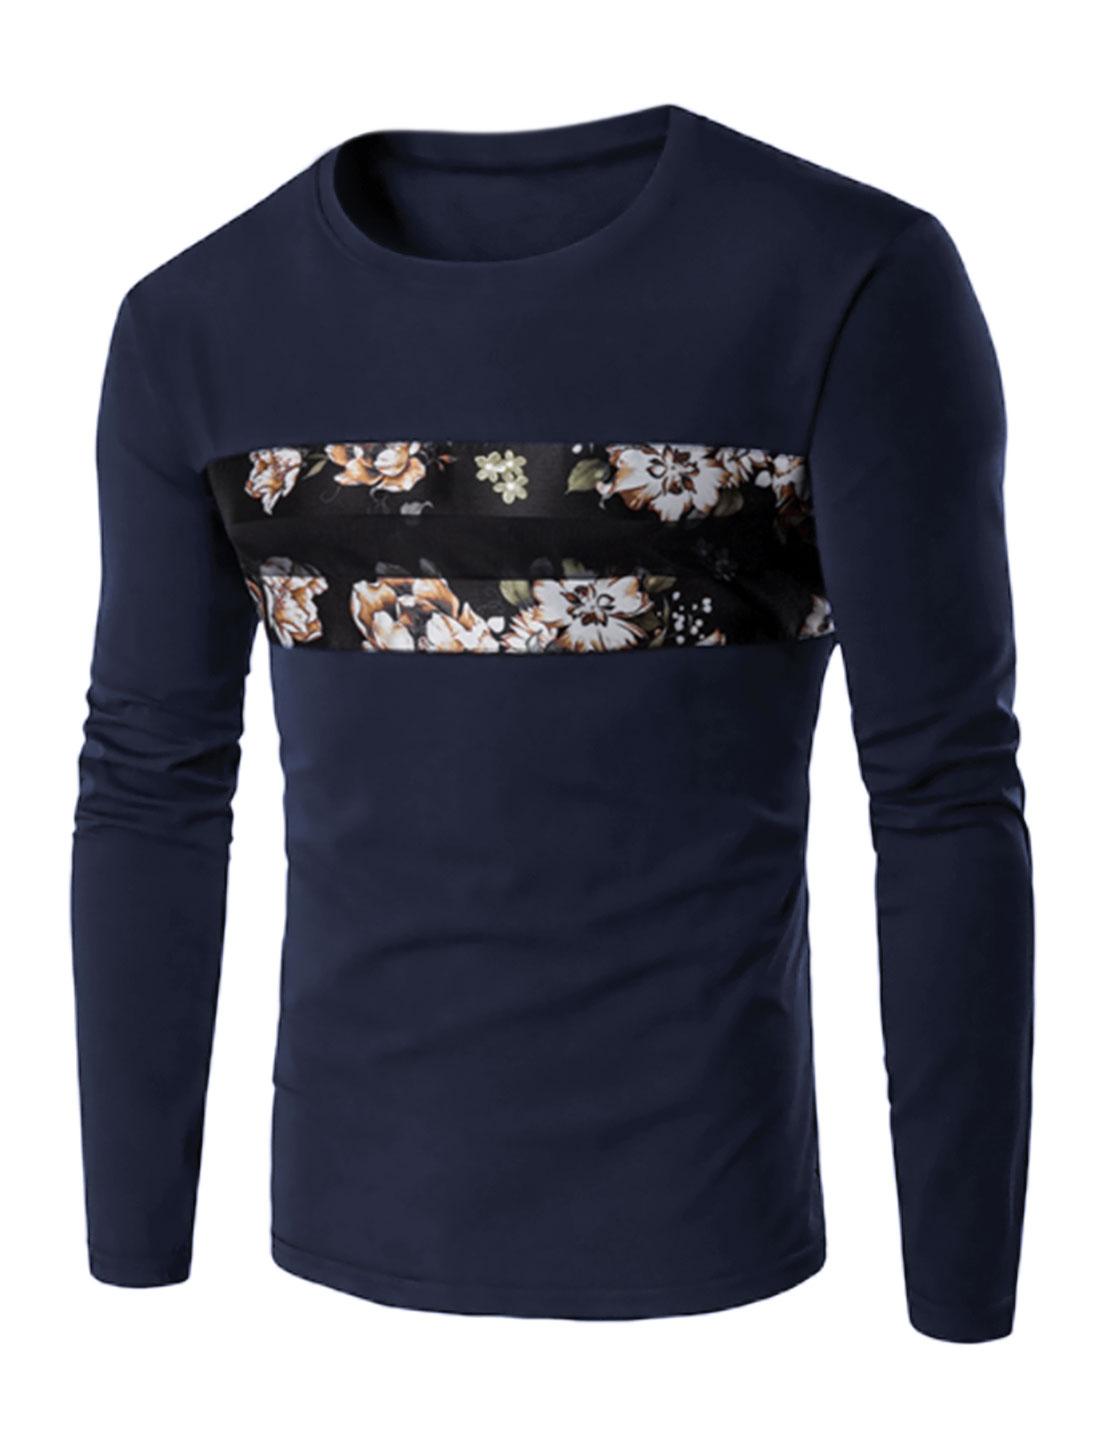 Men Floral Long Sleeve Mesh Panel Contrast Color Slim Fit Tee Blue M